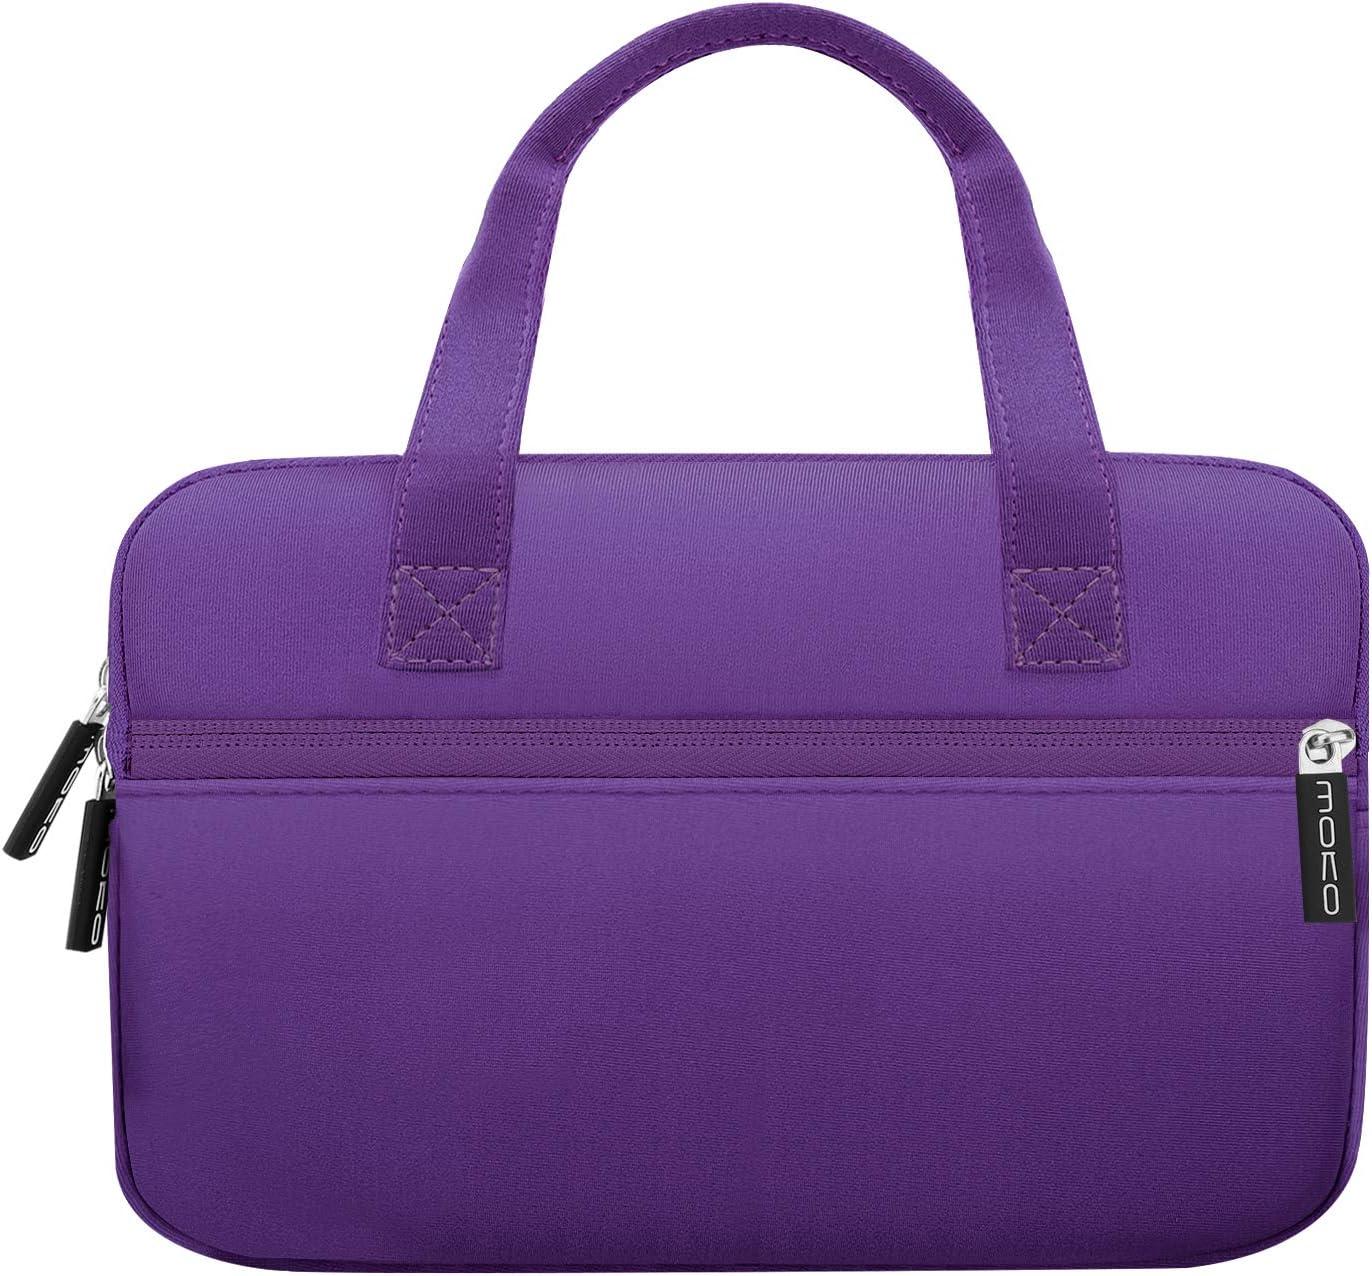 MoKo 7-8 Inch Kids Tablet Sleeve, Portable Neoprene Carrying Case Bag Fits Fire HD 8 Kids Edition 2018/2017, Fire 7 Kids Edition, Fire HD 8 Plus/Fire HD 8 2020, Fire 7, Kindle E-Reader, Purple